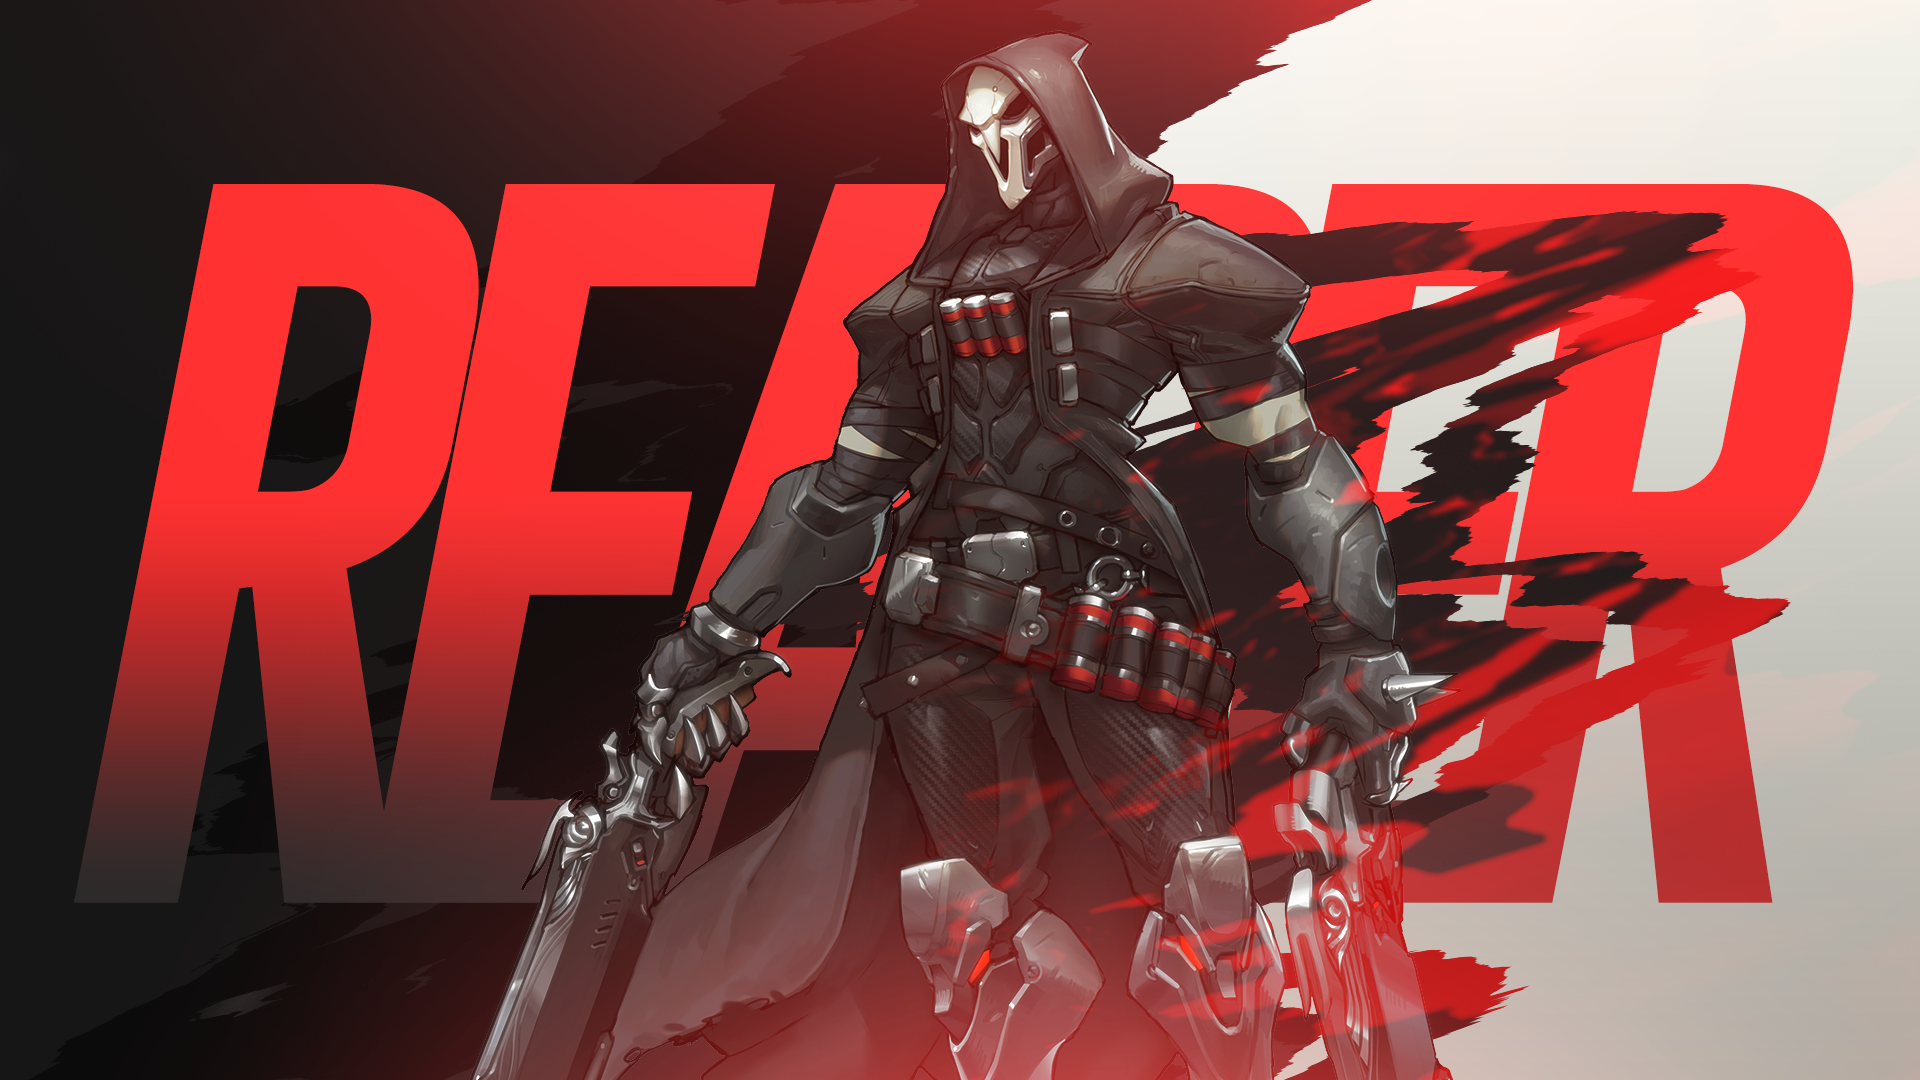 156 Reaper Overwatch Fondos De Pantalla Hd Fondos De